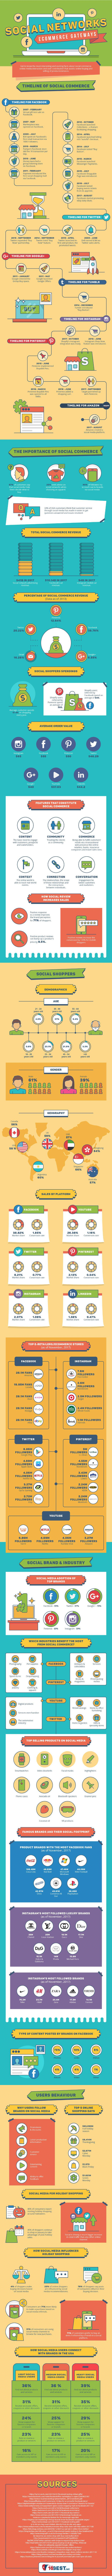 infographie social commerce